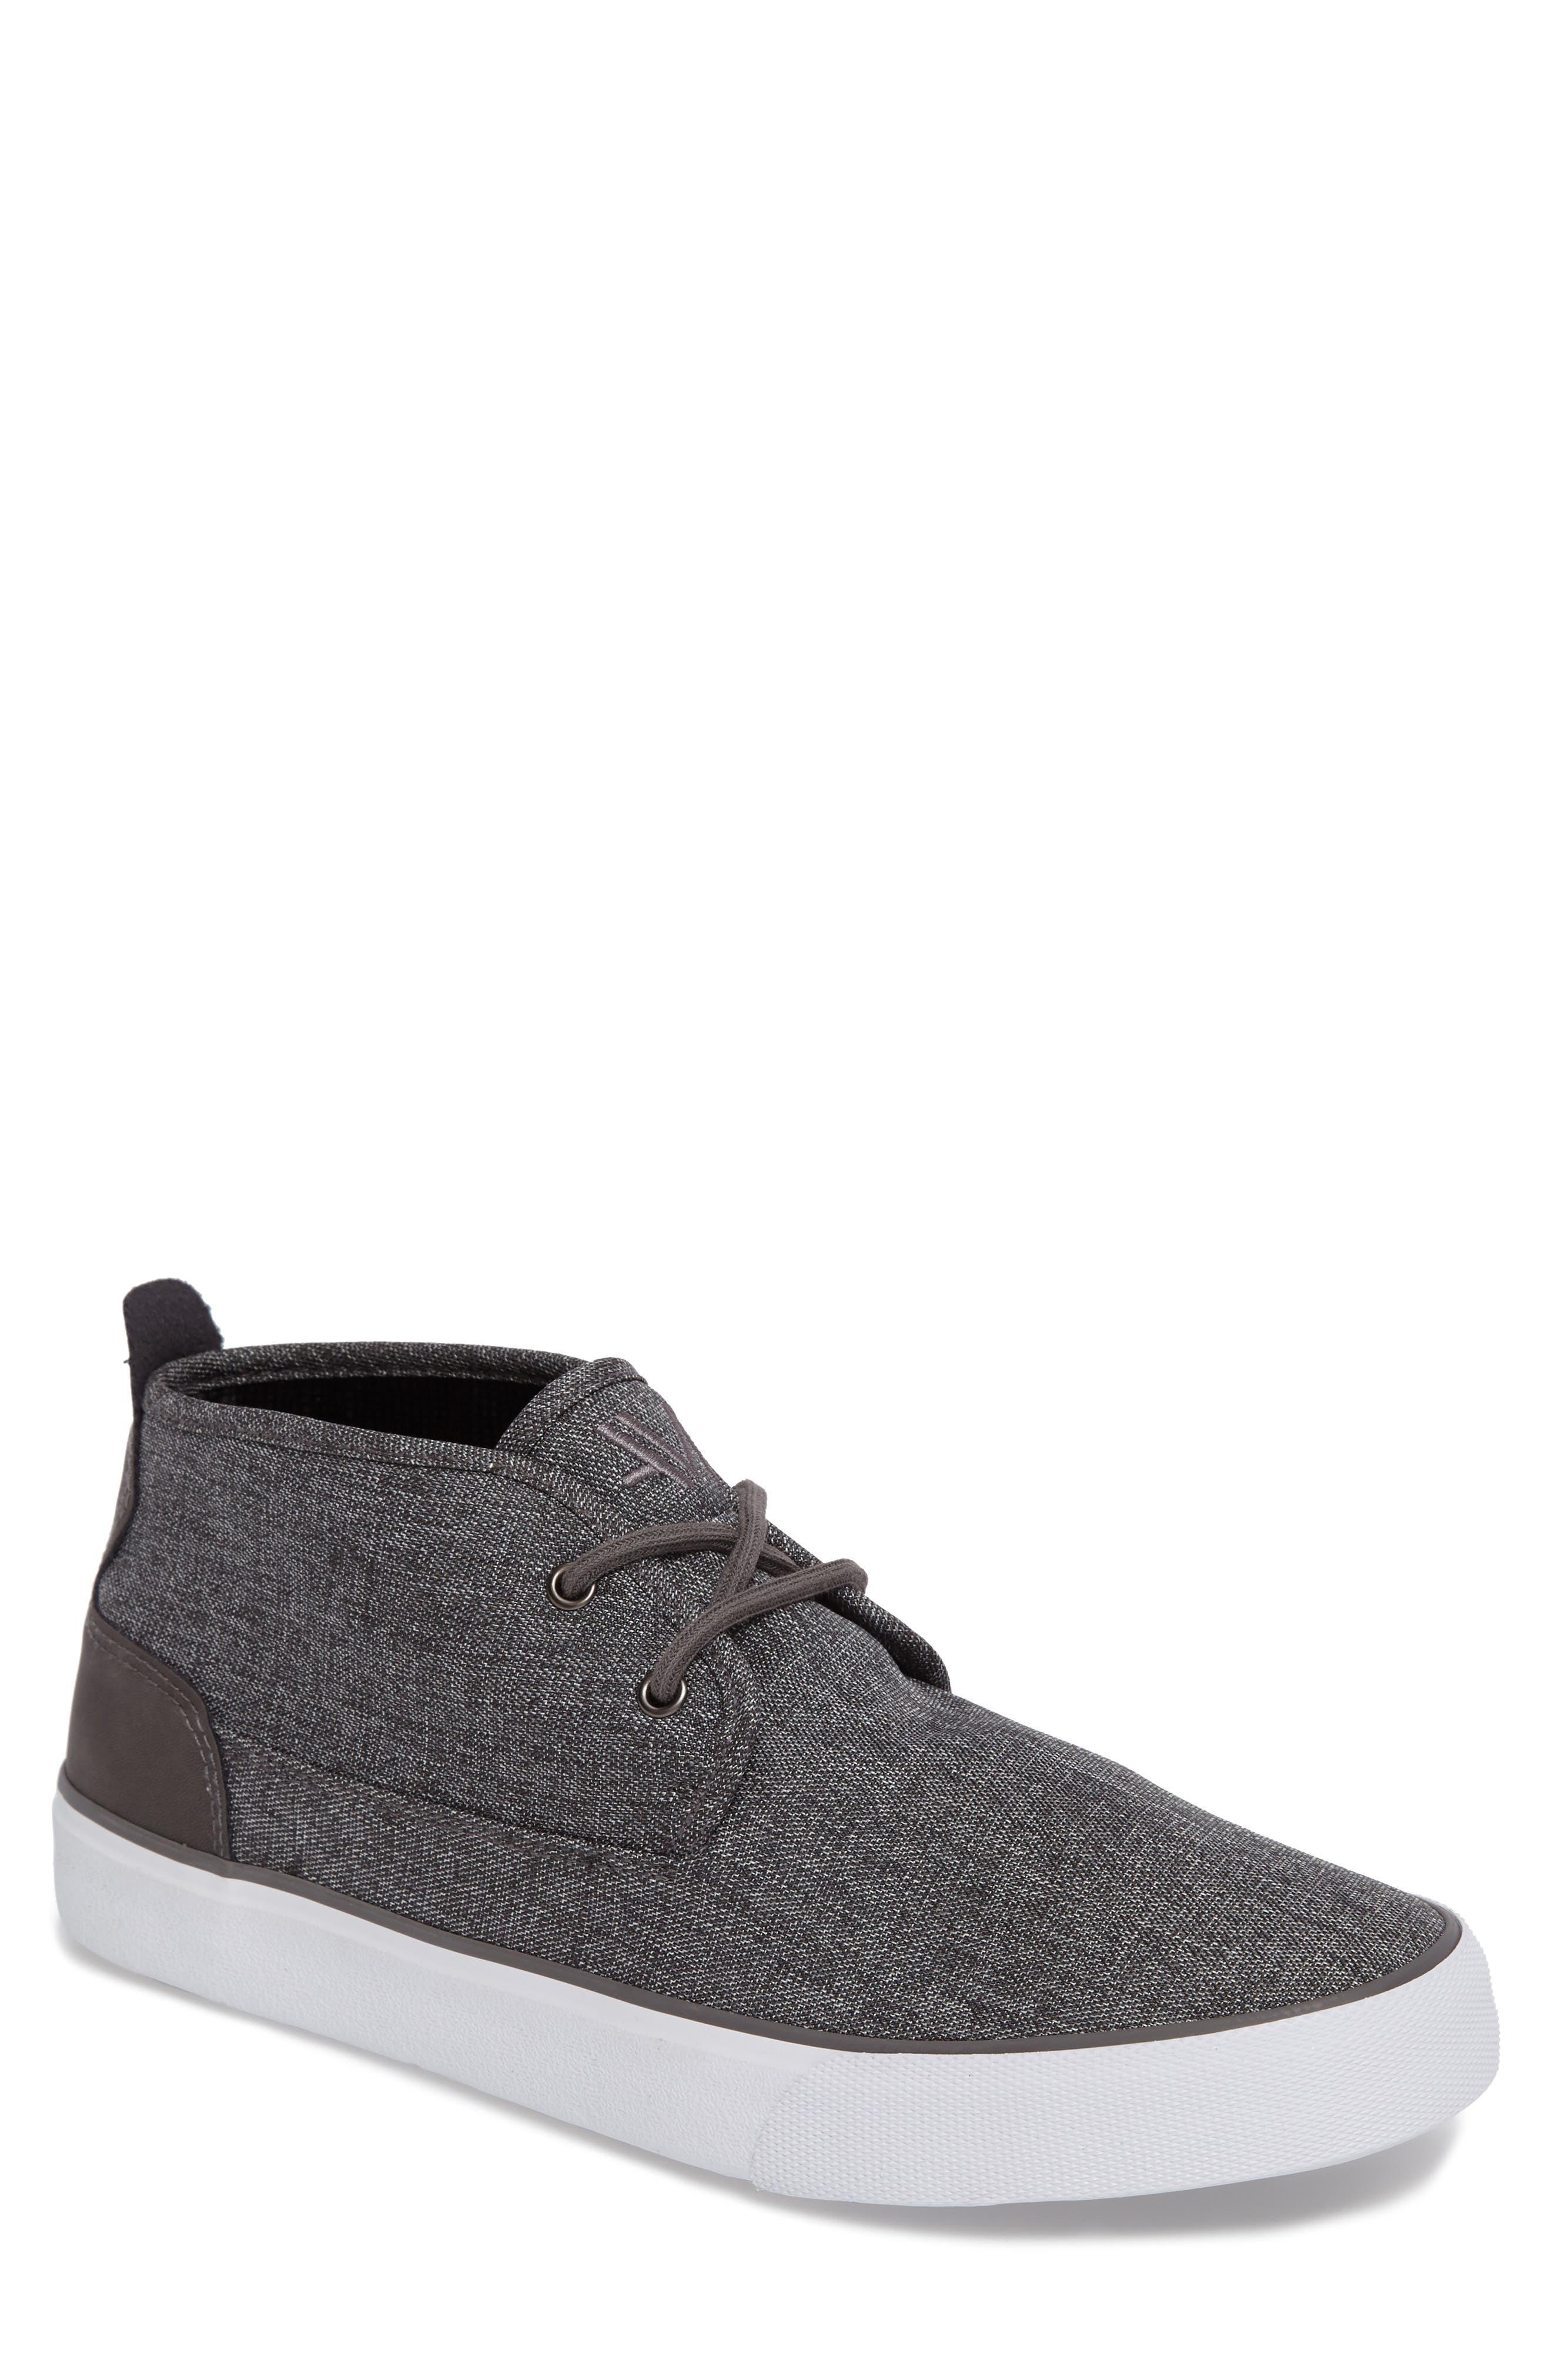 Reade Chukka Sneaker,                         Main,                         color, Charcoal/Dk Charcoal/White